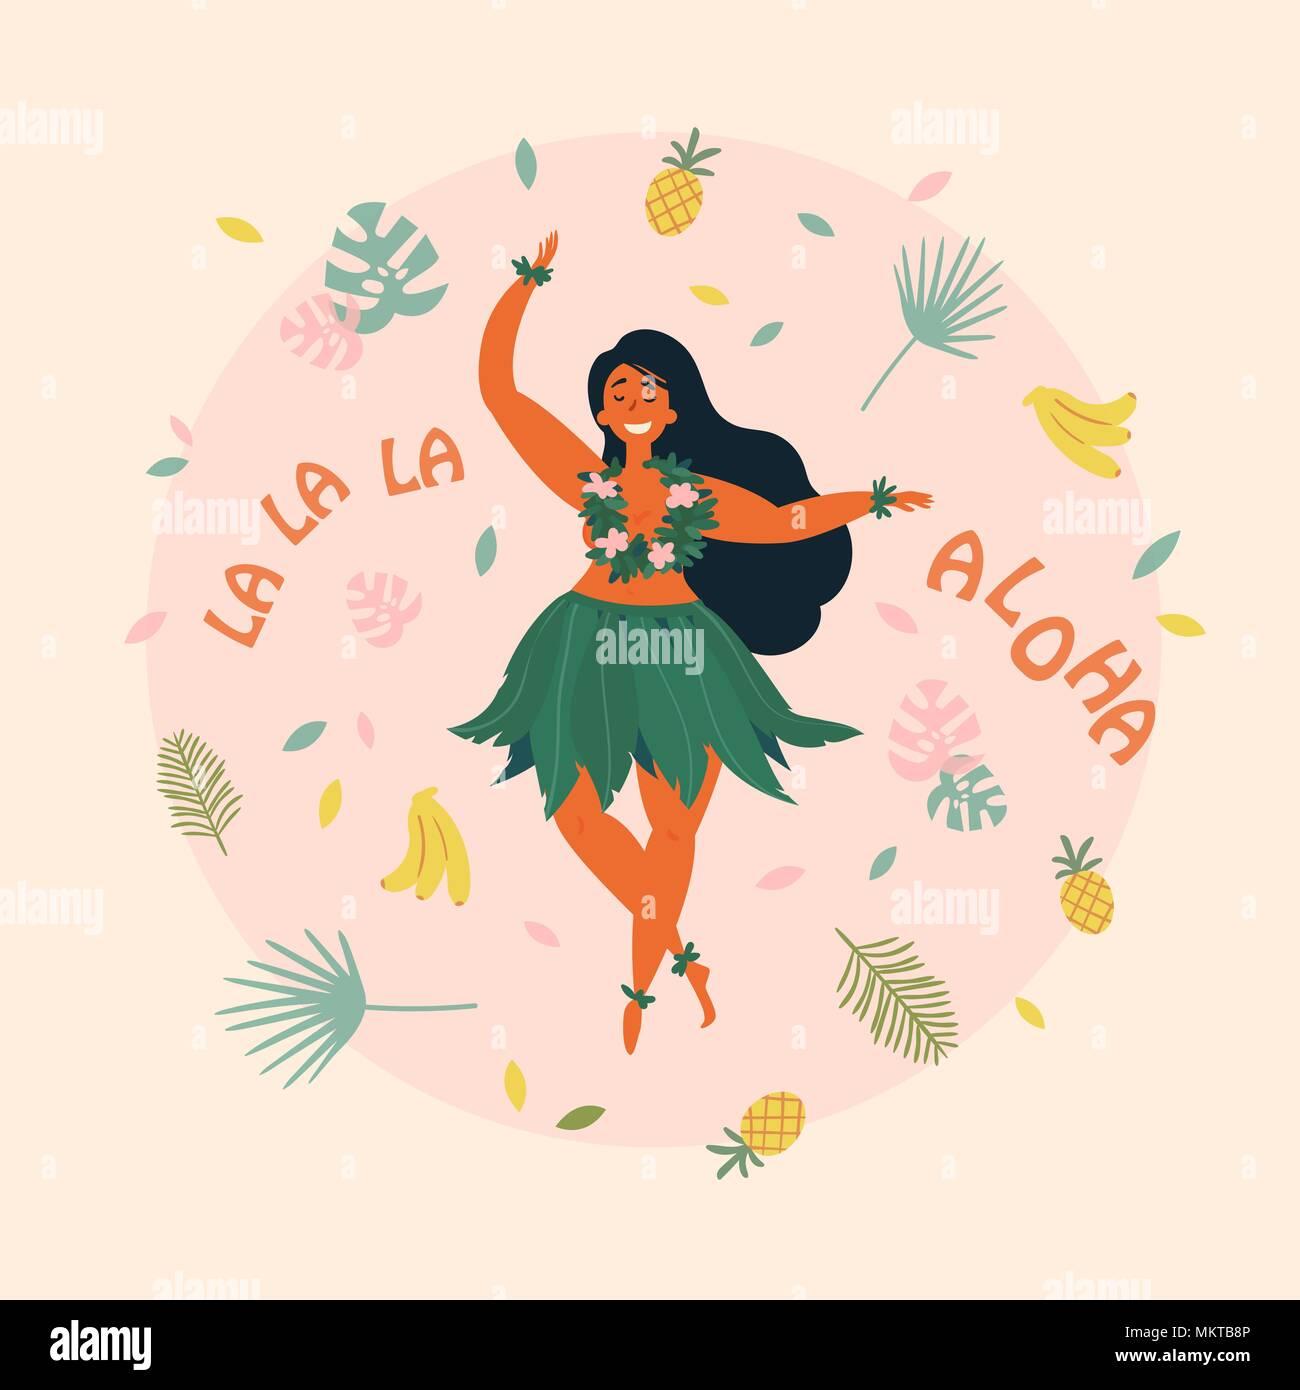 Aloha. Hawaiian holidays poster with Hula dancer - Stock Vector